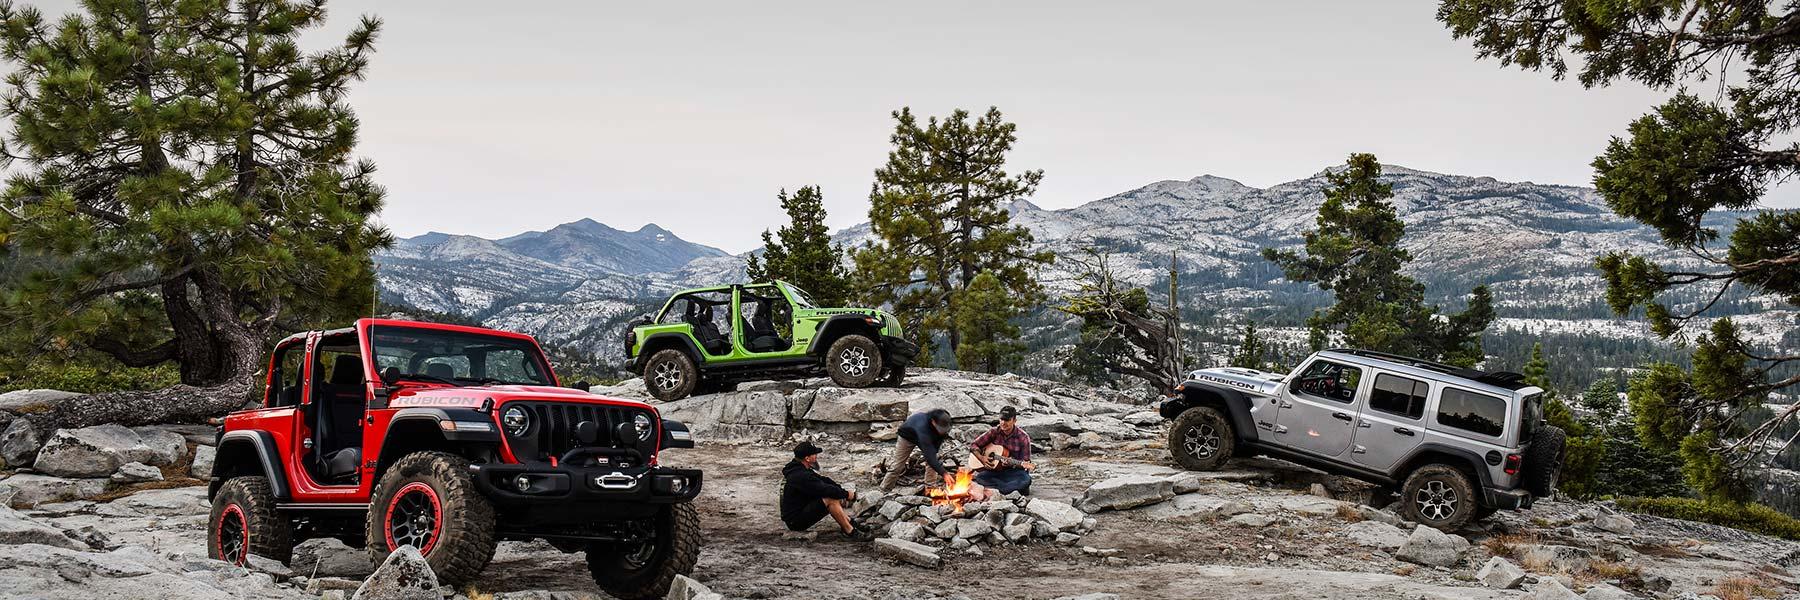 Jeep Jamboree USA Forms - Jeep Jamboree U.S.A.